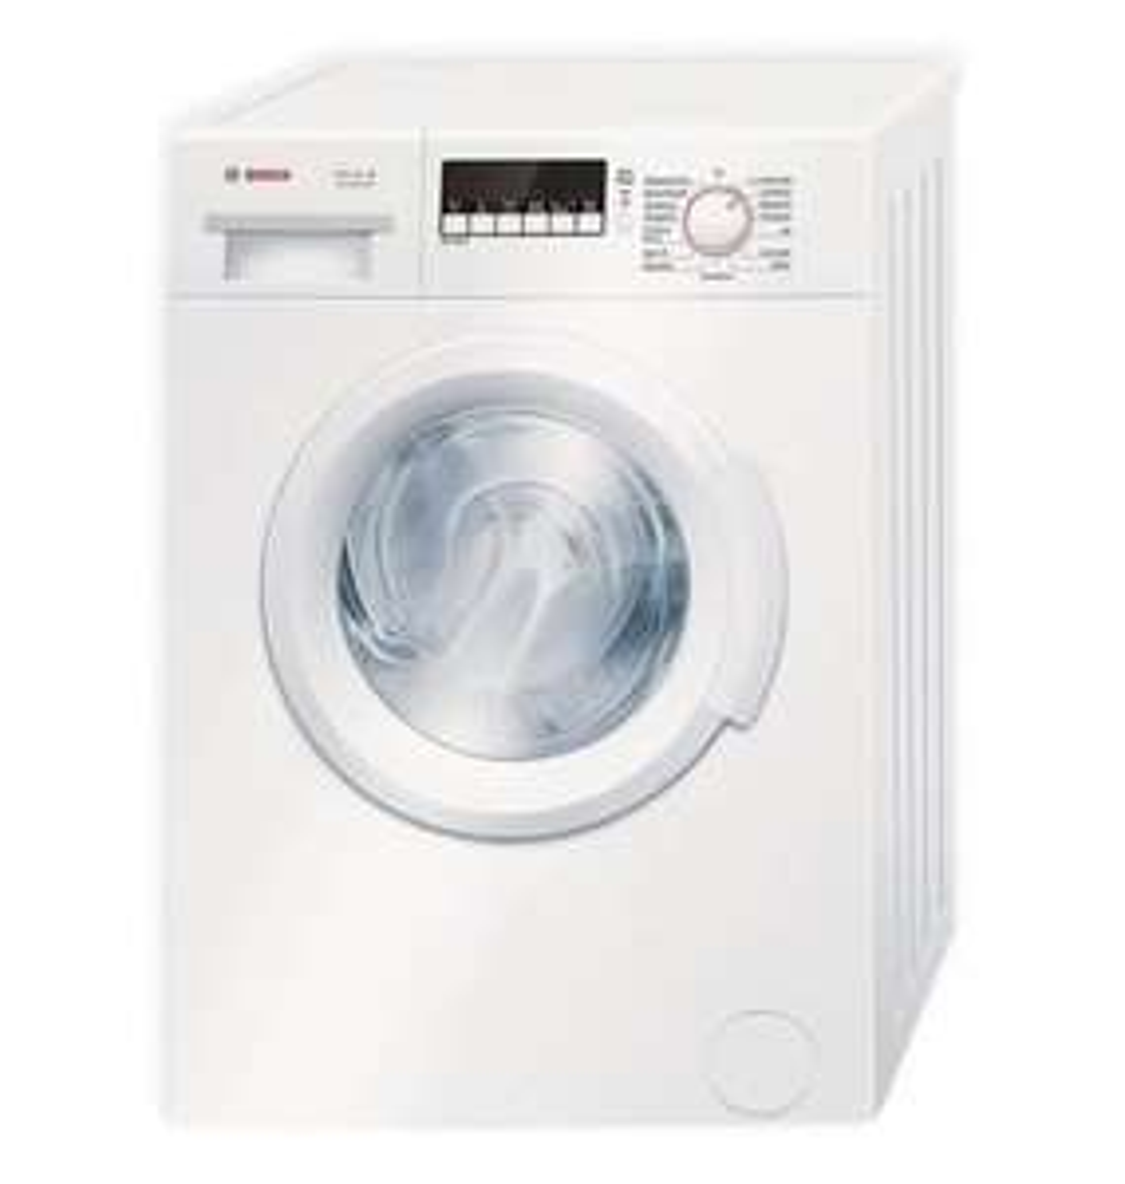 BOSCH Waschmaschine - WAB28270 - A+++ / Serie 2 Maschine